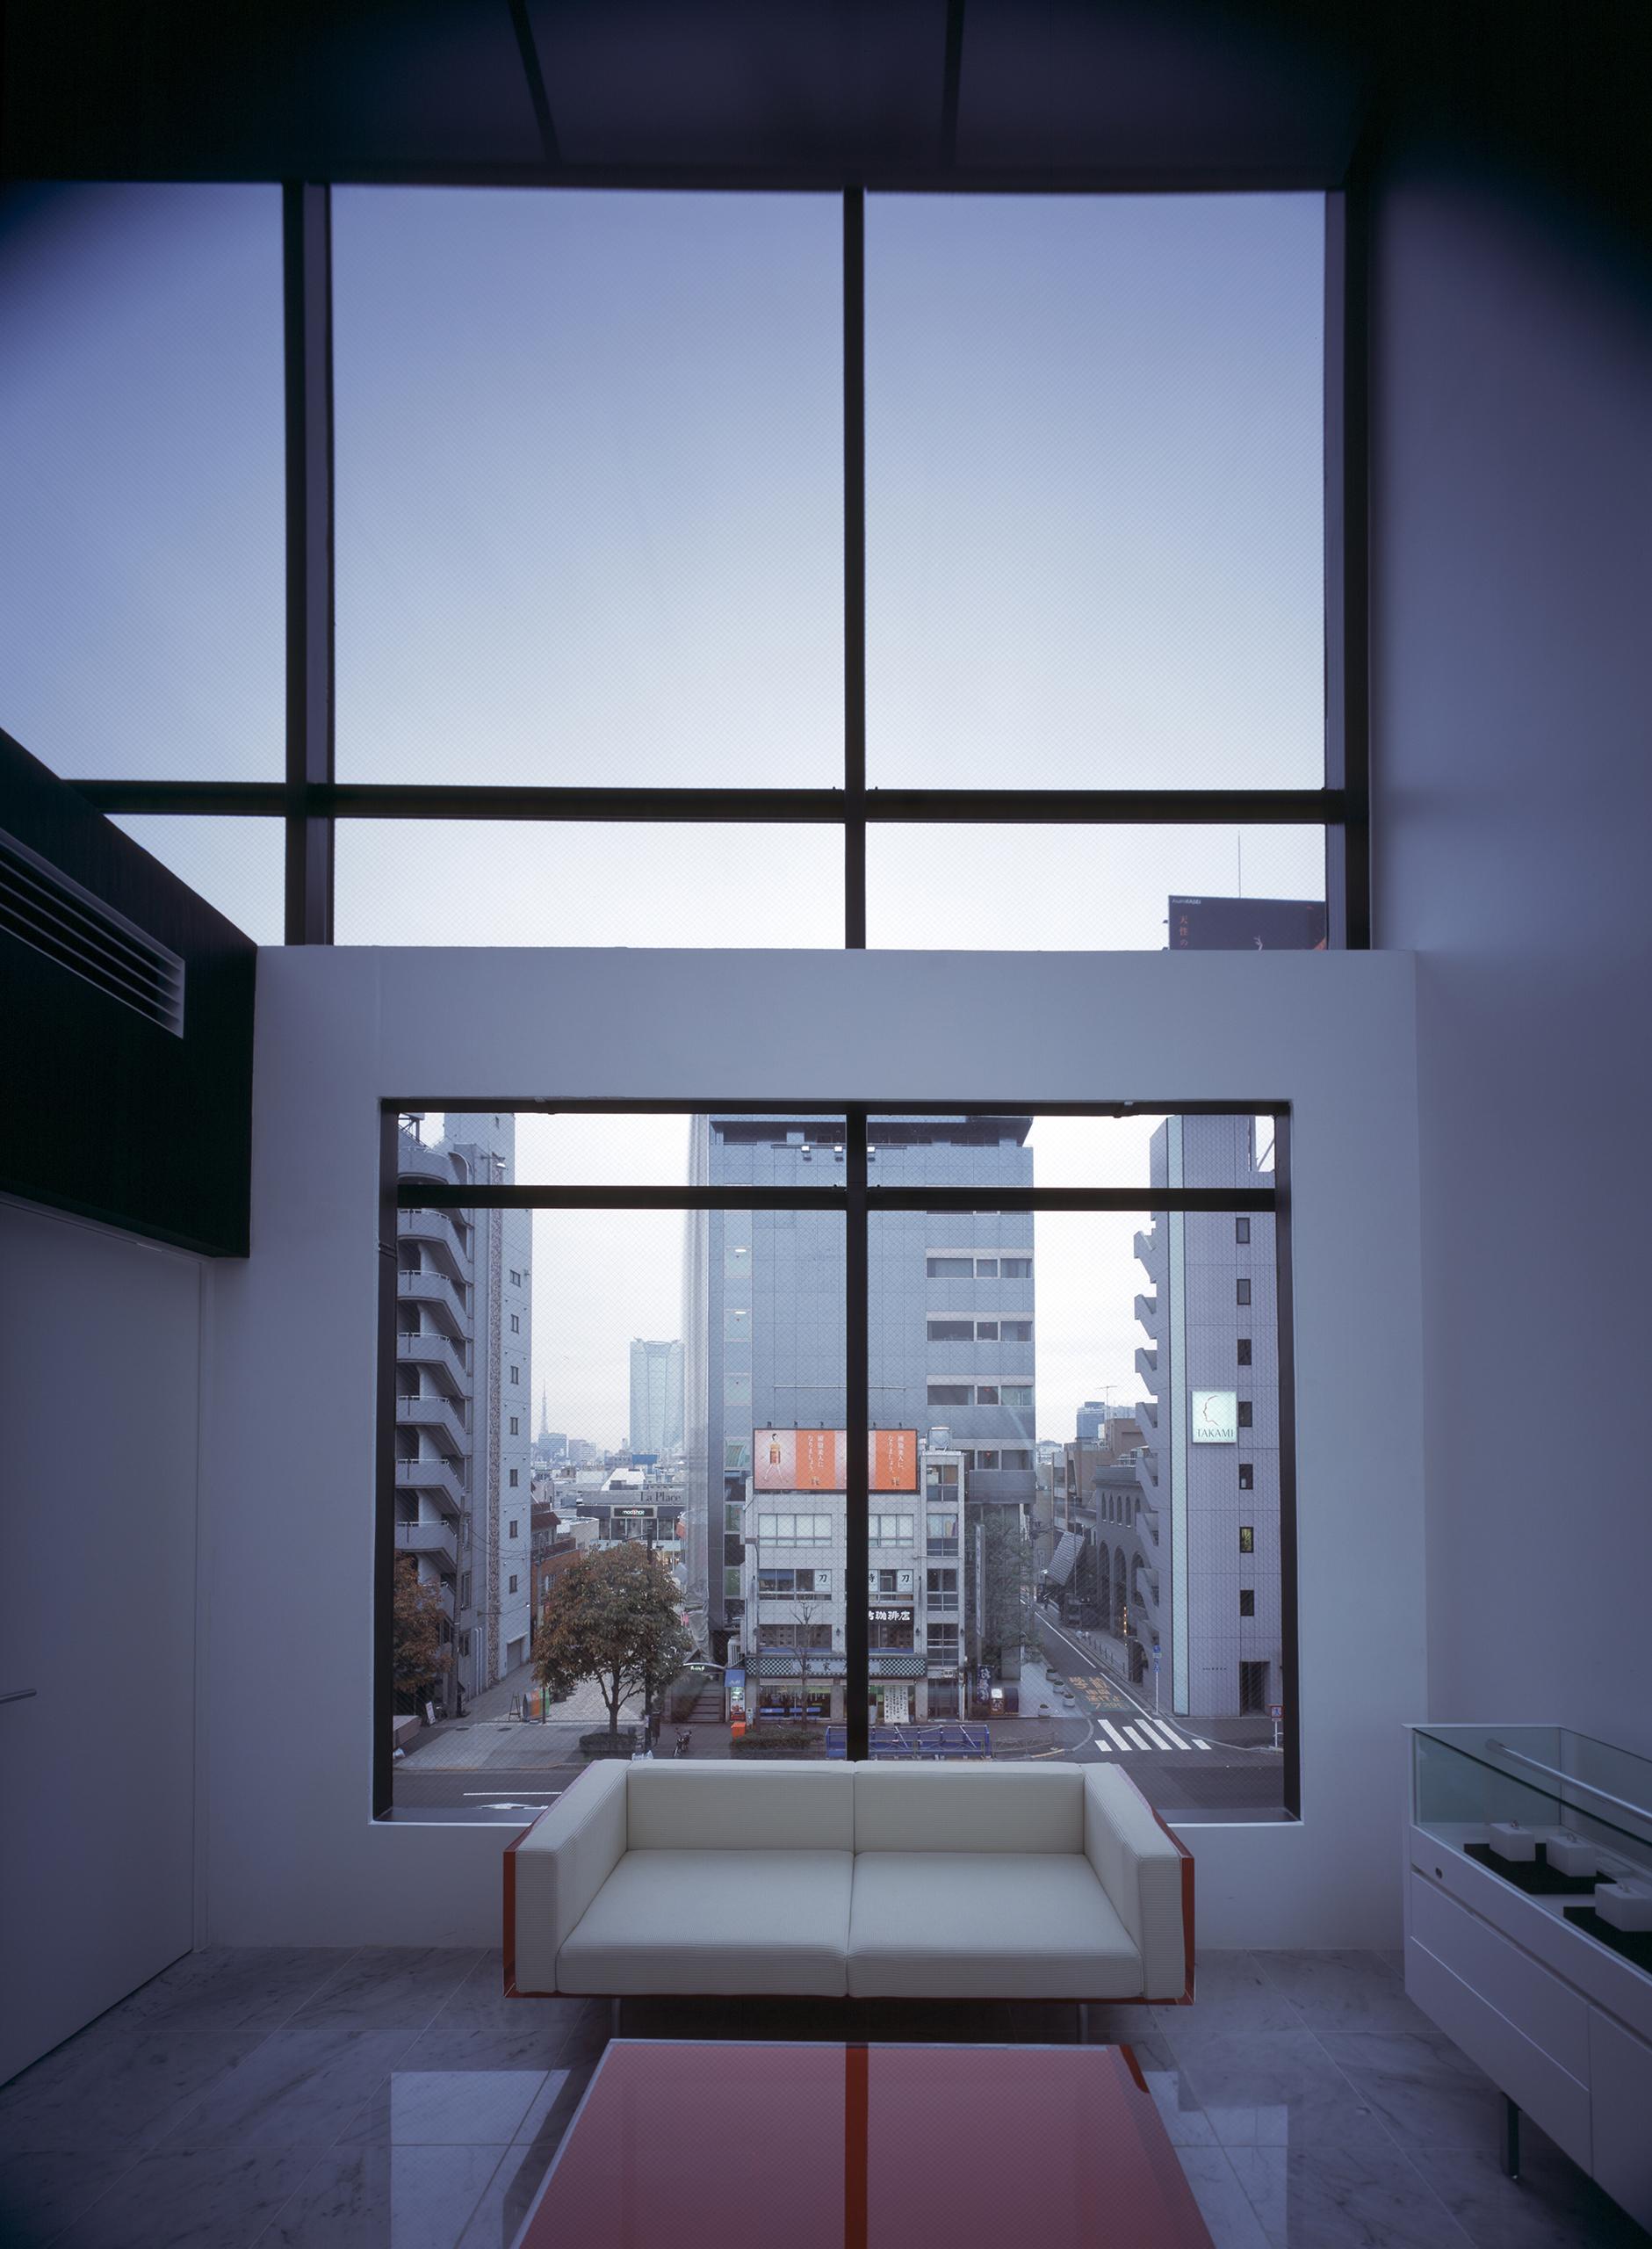 LUNA-DI-MIELE Omotesando Building | WORKS |